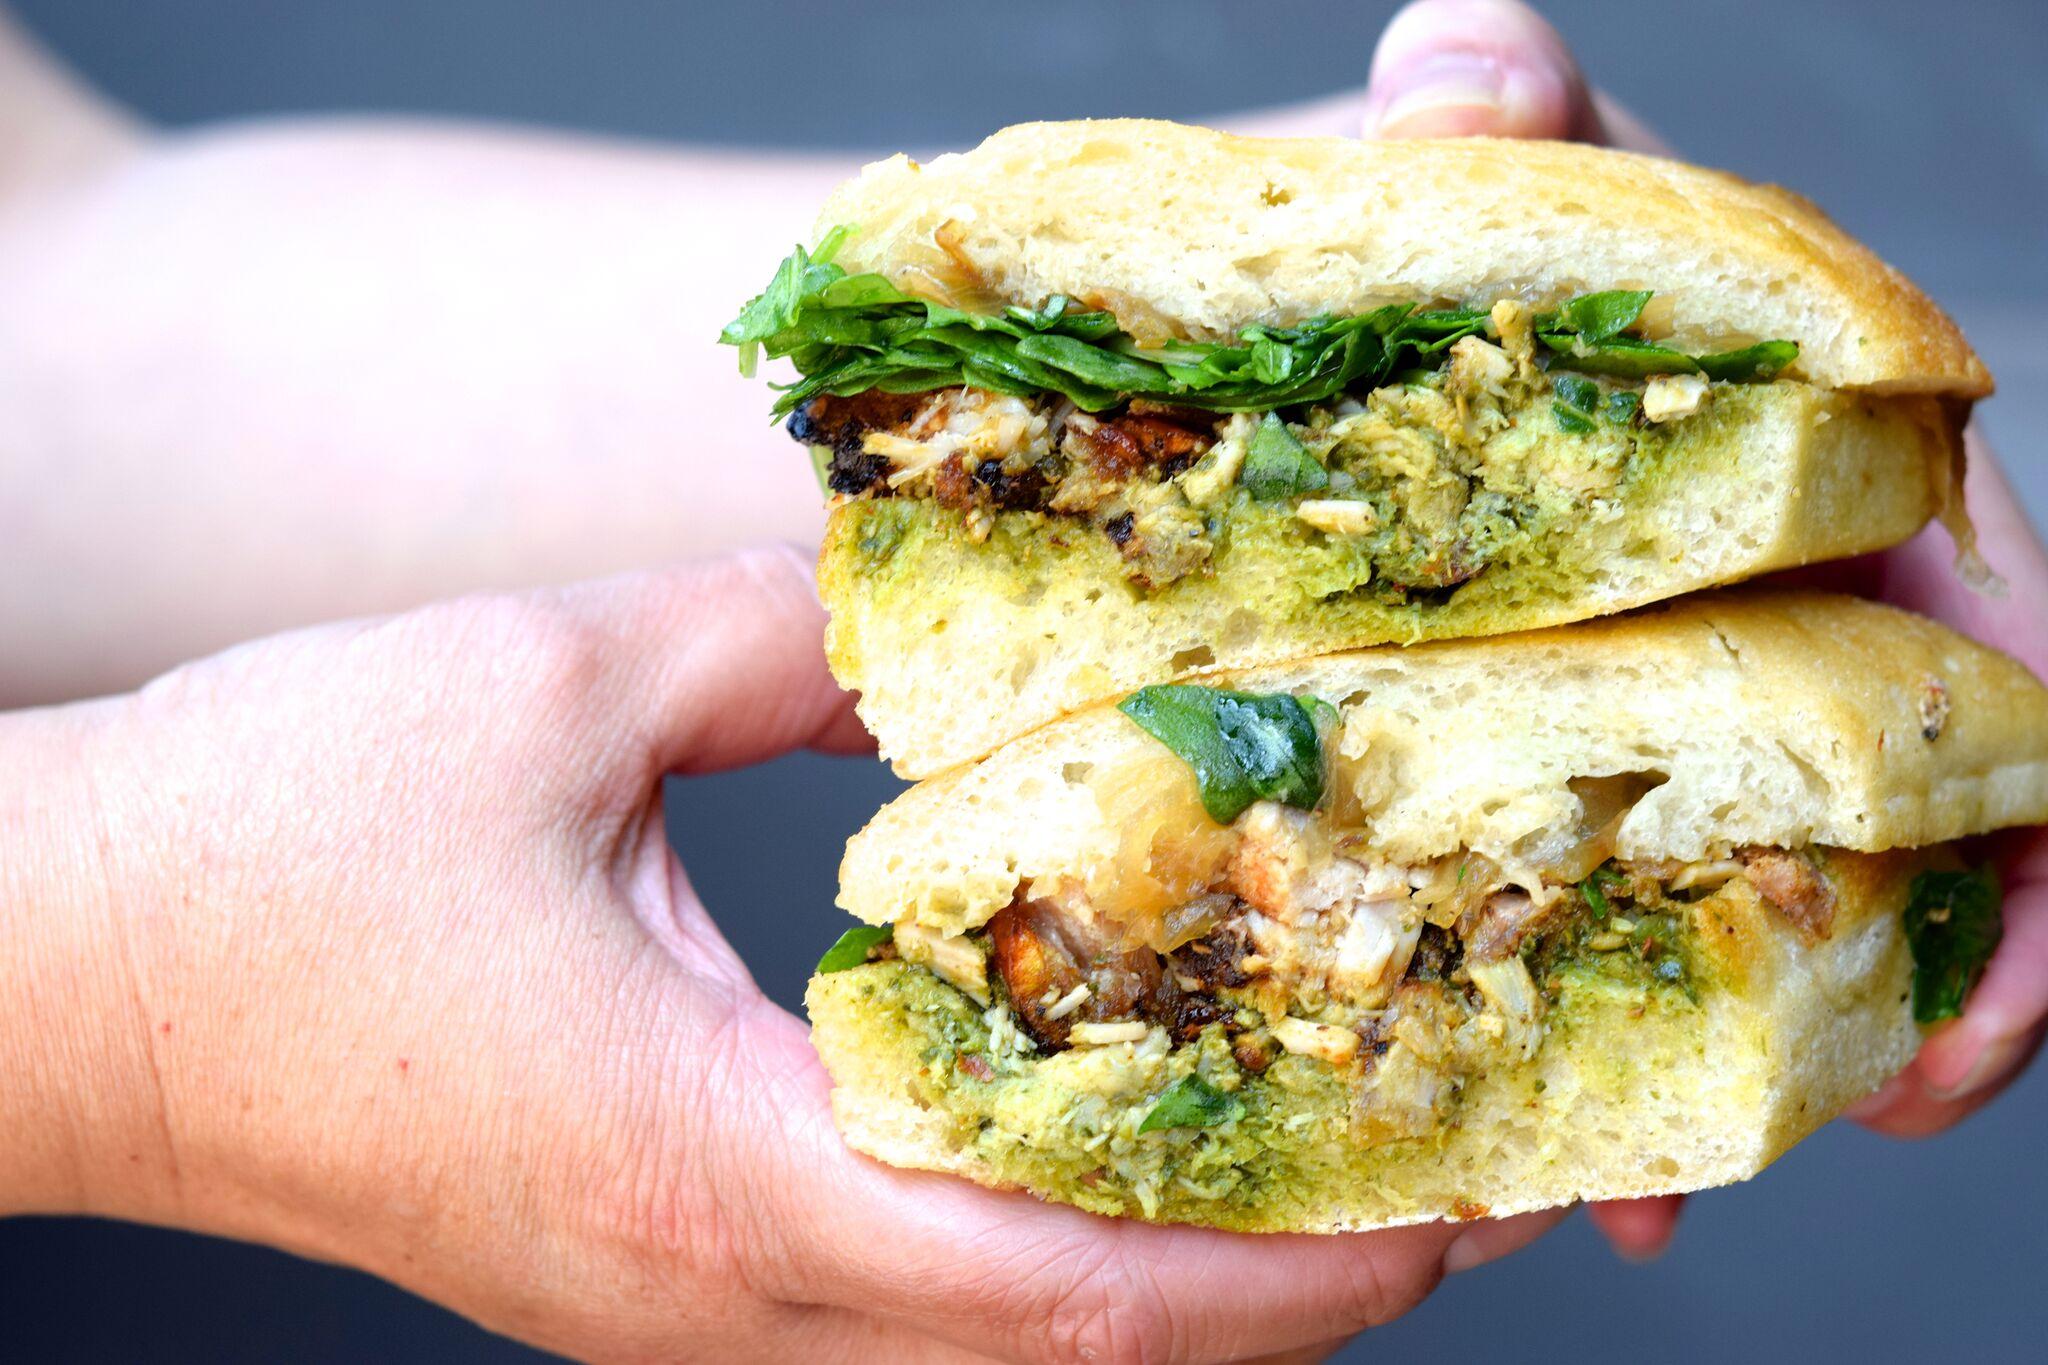 Porchetta sandwich | photo courtesy of 100eats